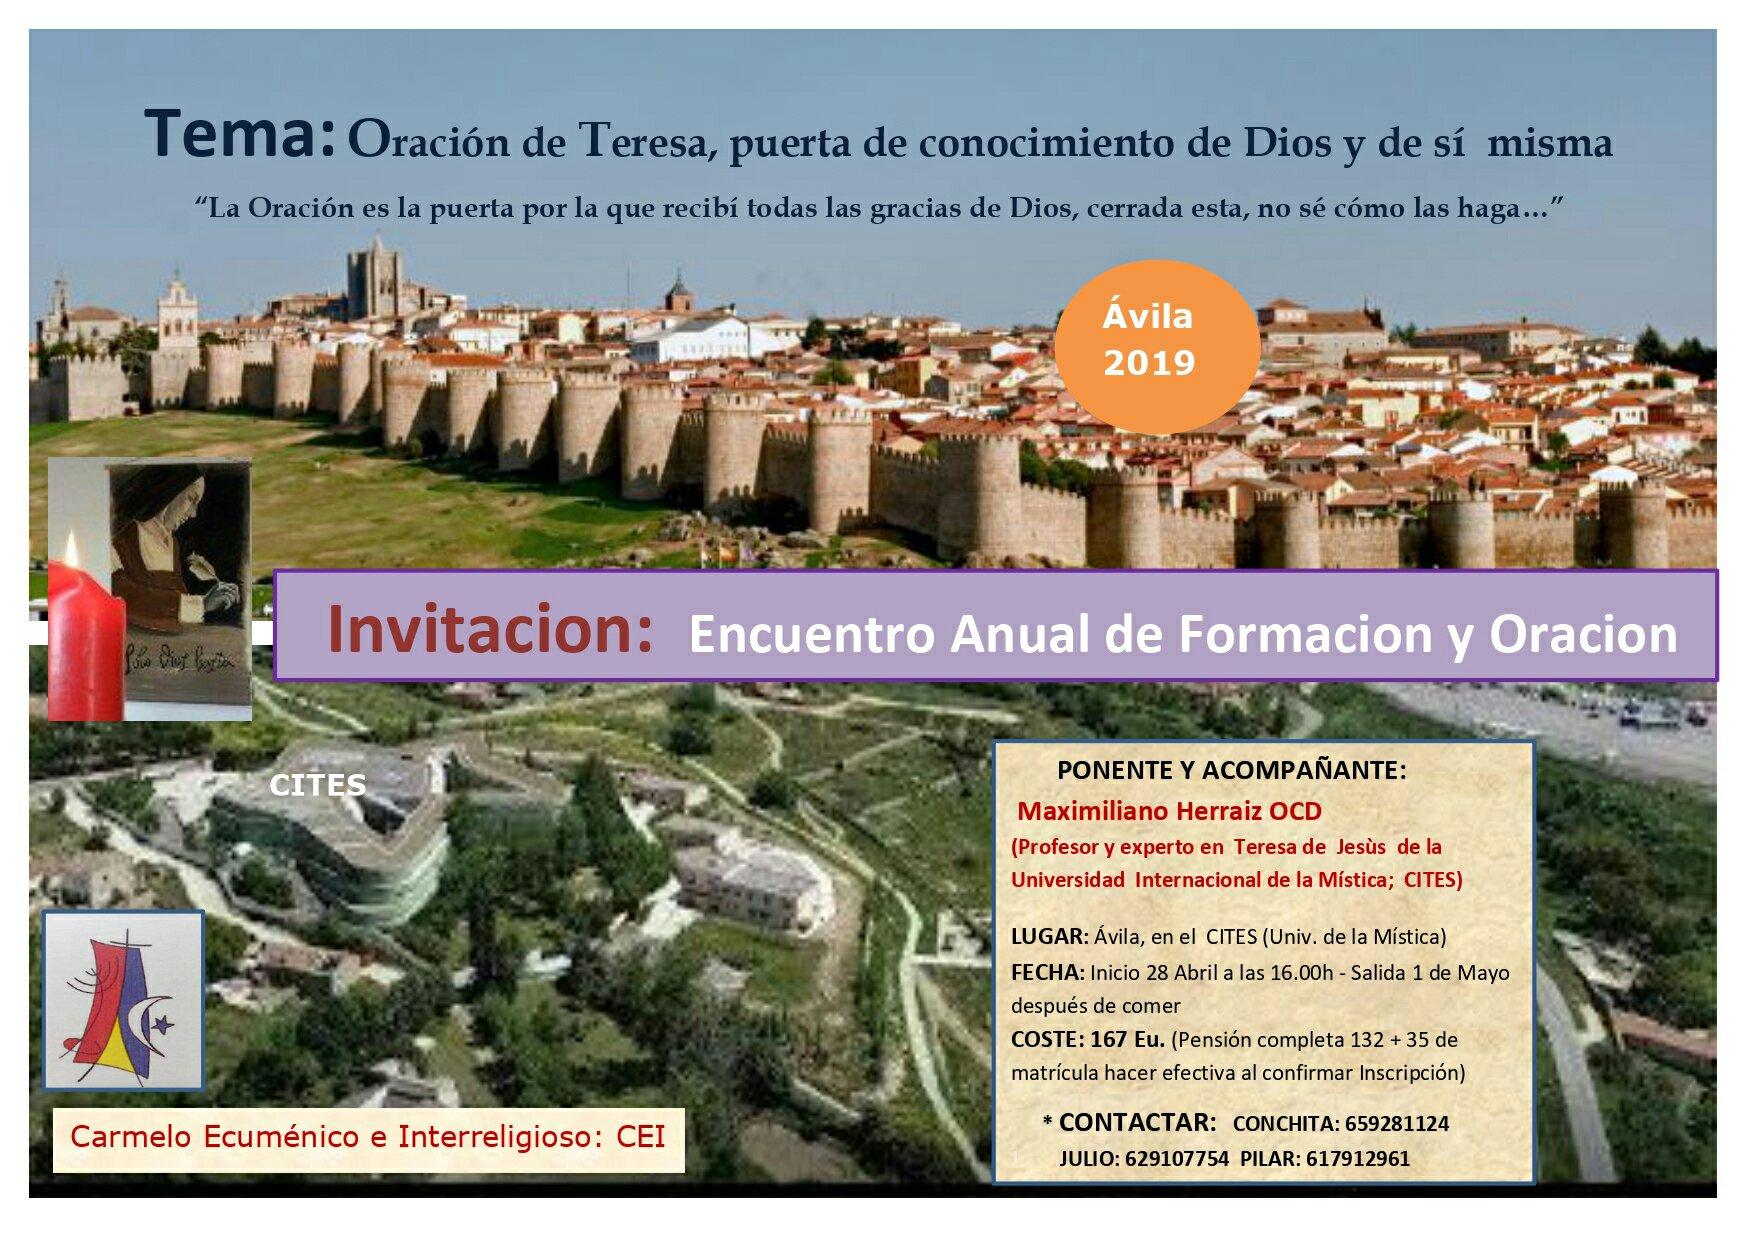 4 definitivo invitacion (1)_pages-to-jpg-2558421698..jpg